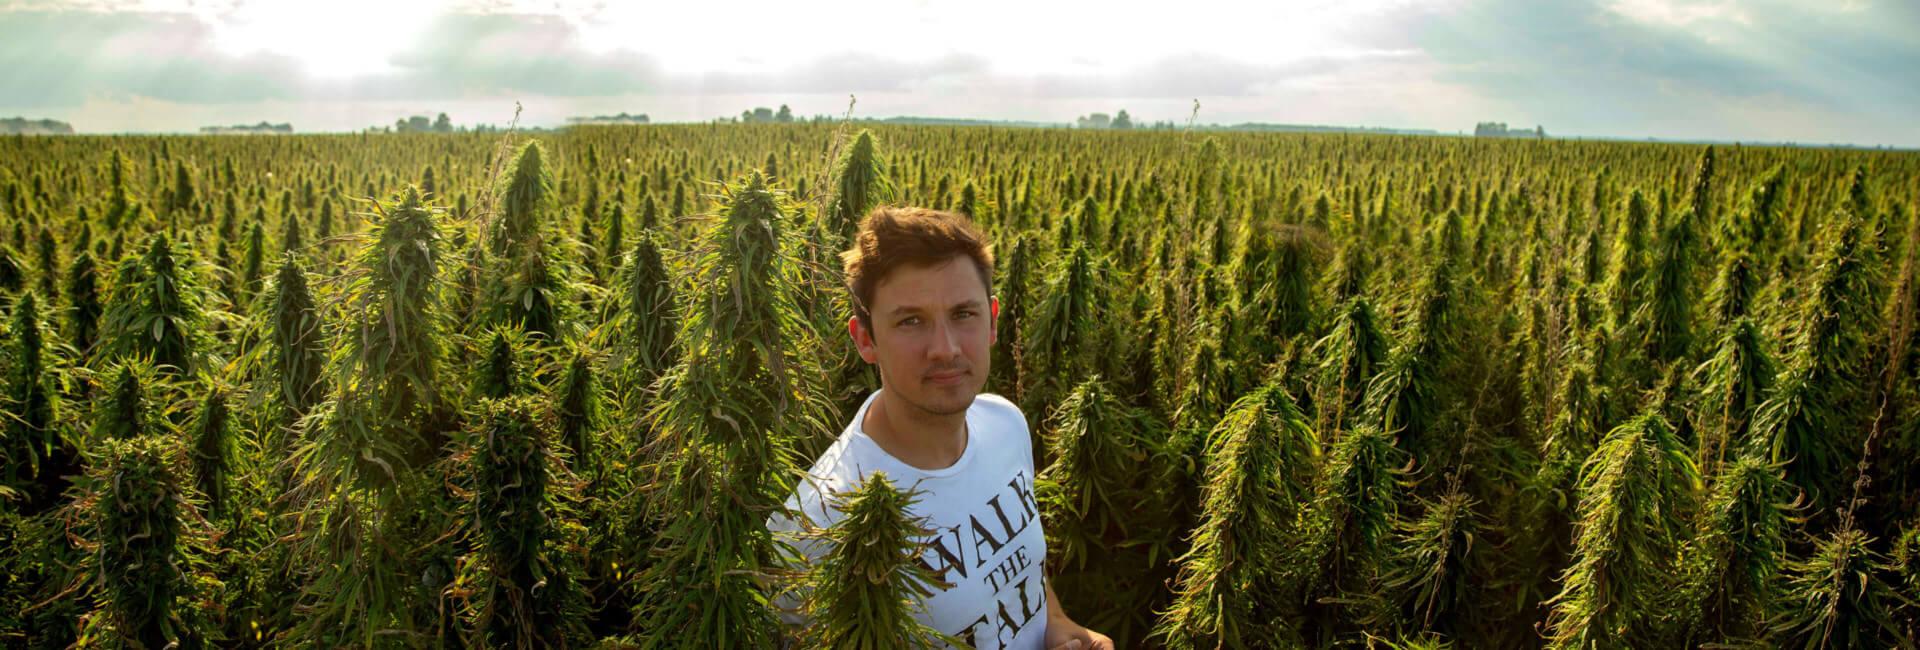 Henry Vincenty in hemp field wearing white t-shirt with words 'walk the talk'